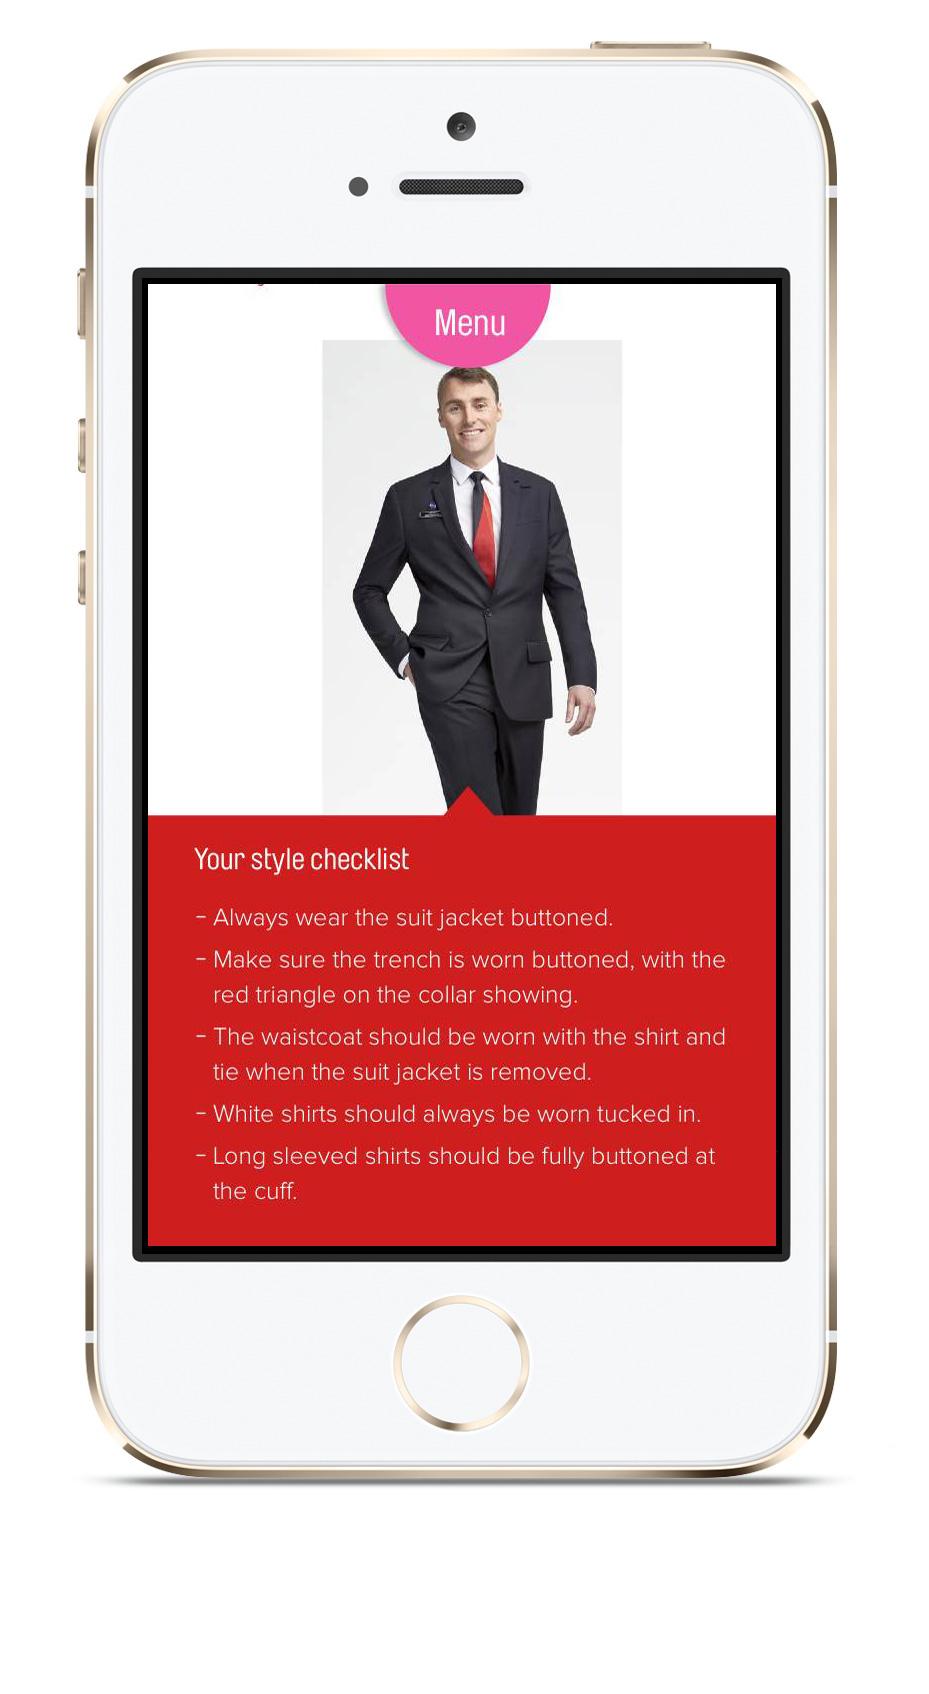 Qantas-iPhone-07.jpg